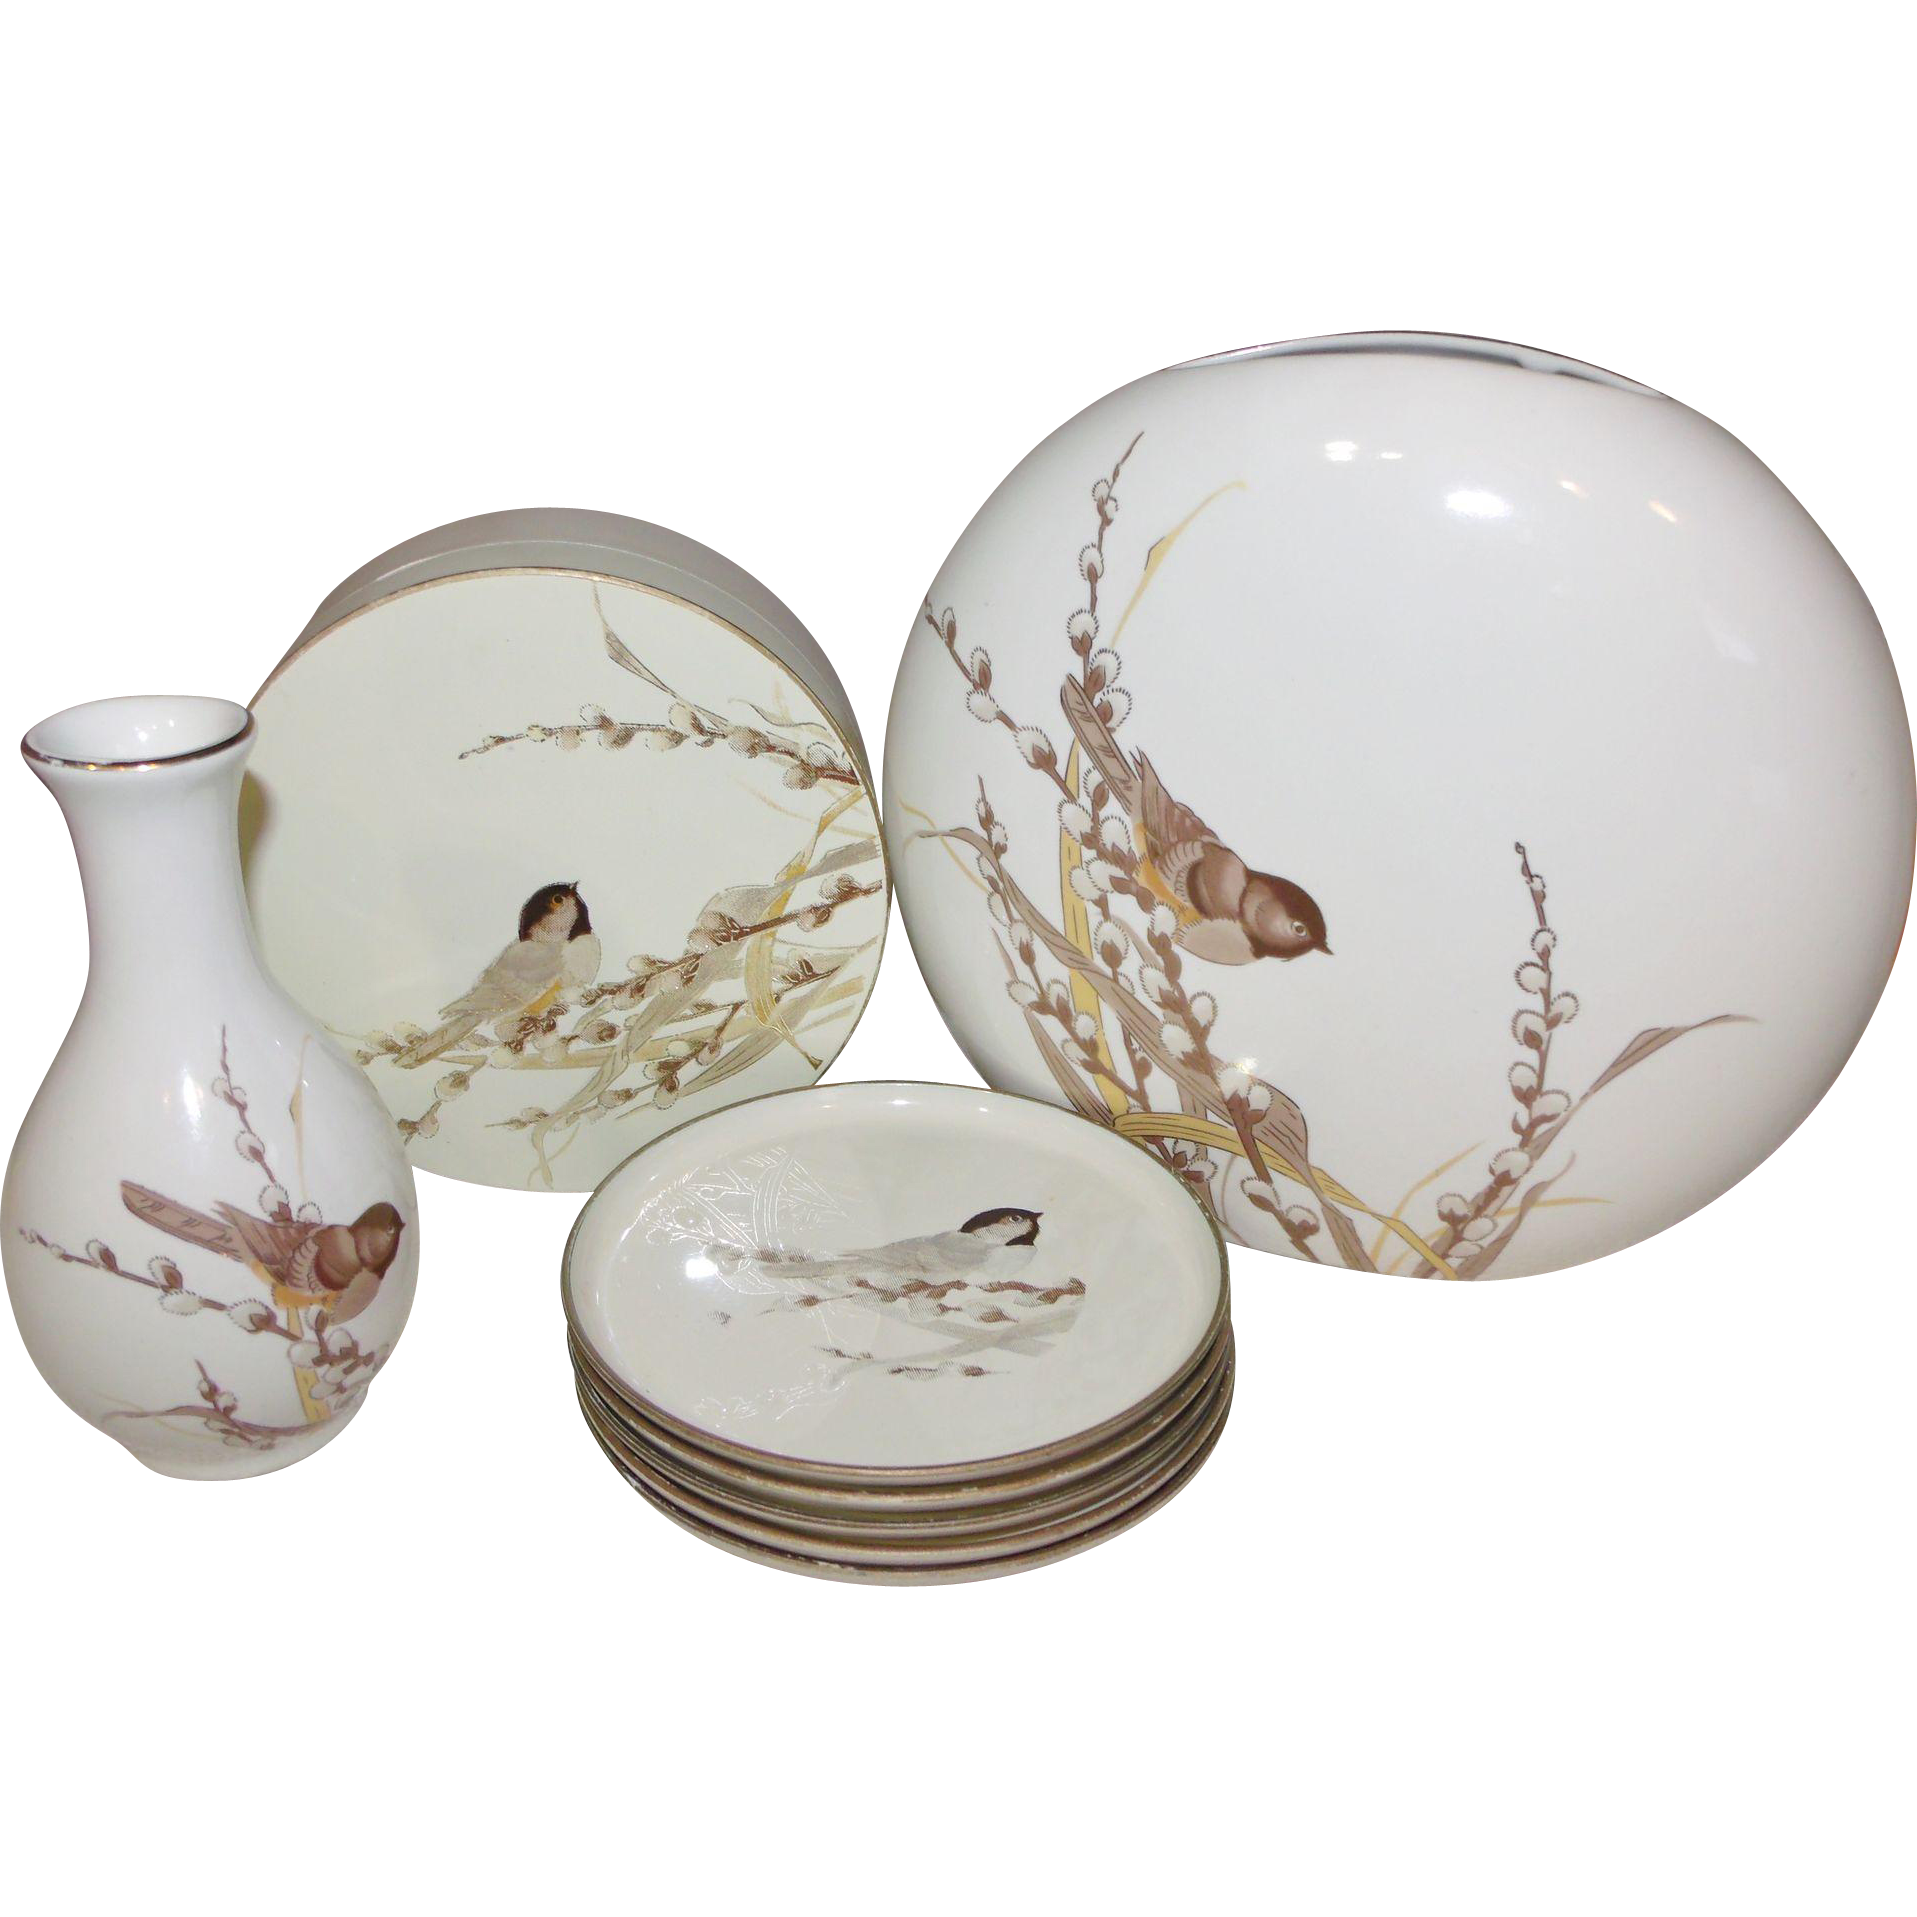 Otagiri Bird On Pussy-willows Lacquerware Coasters & Porcelain Vases